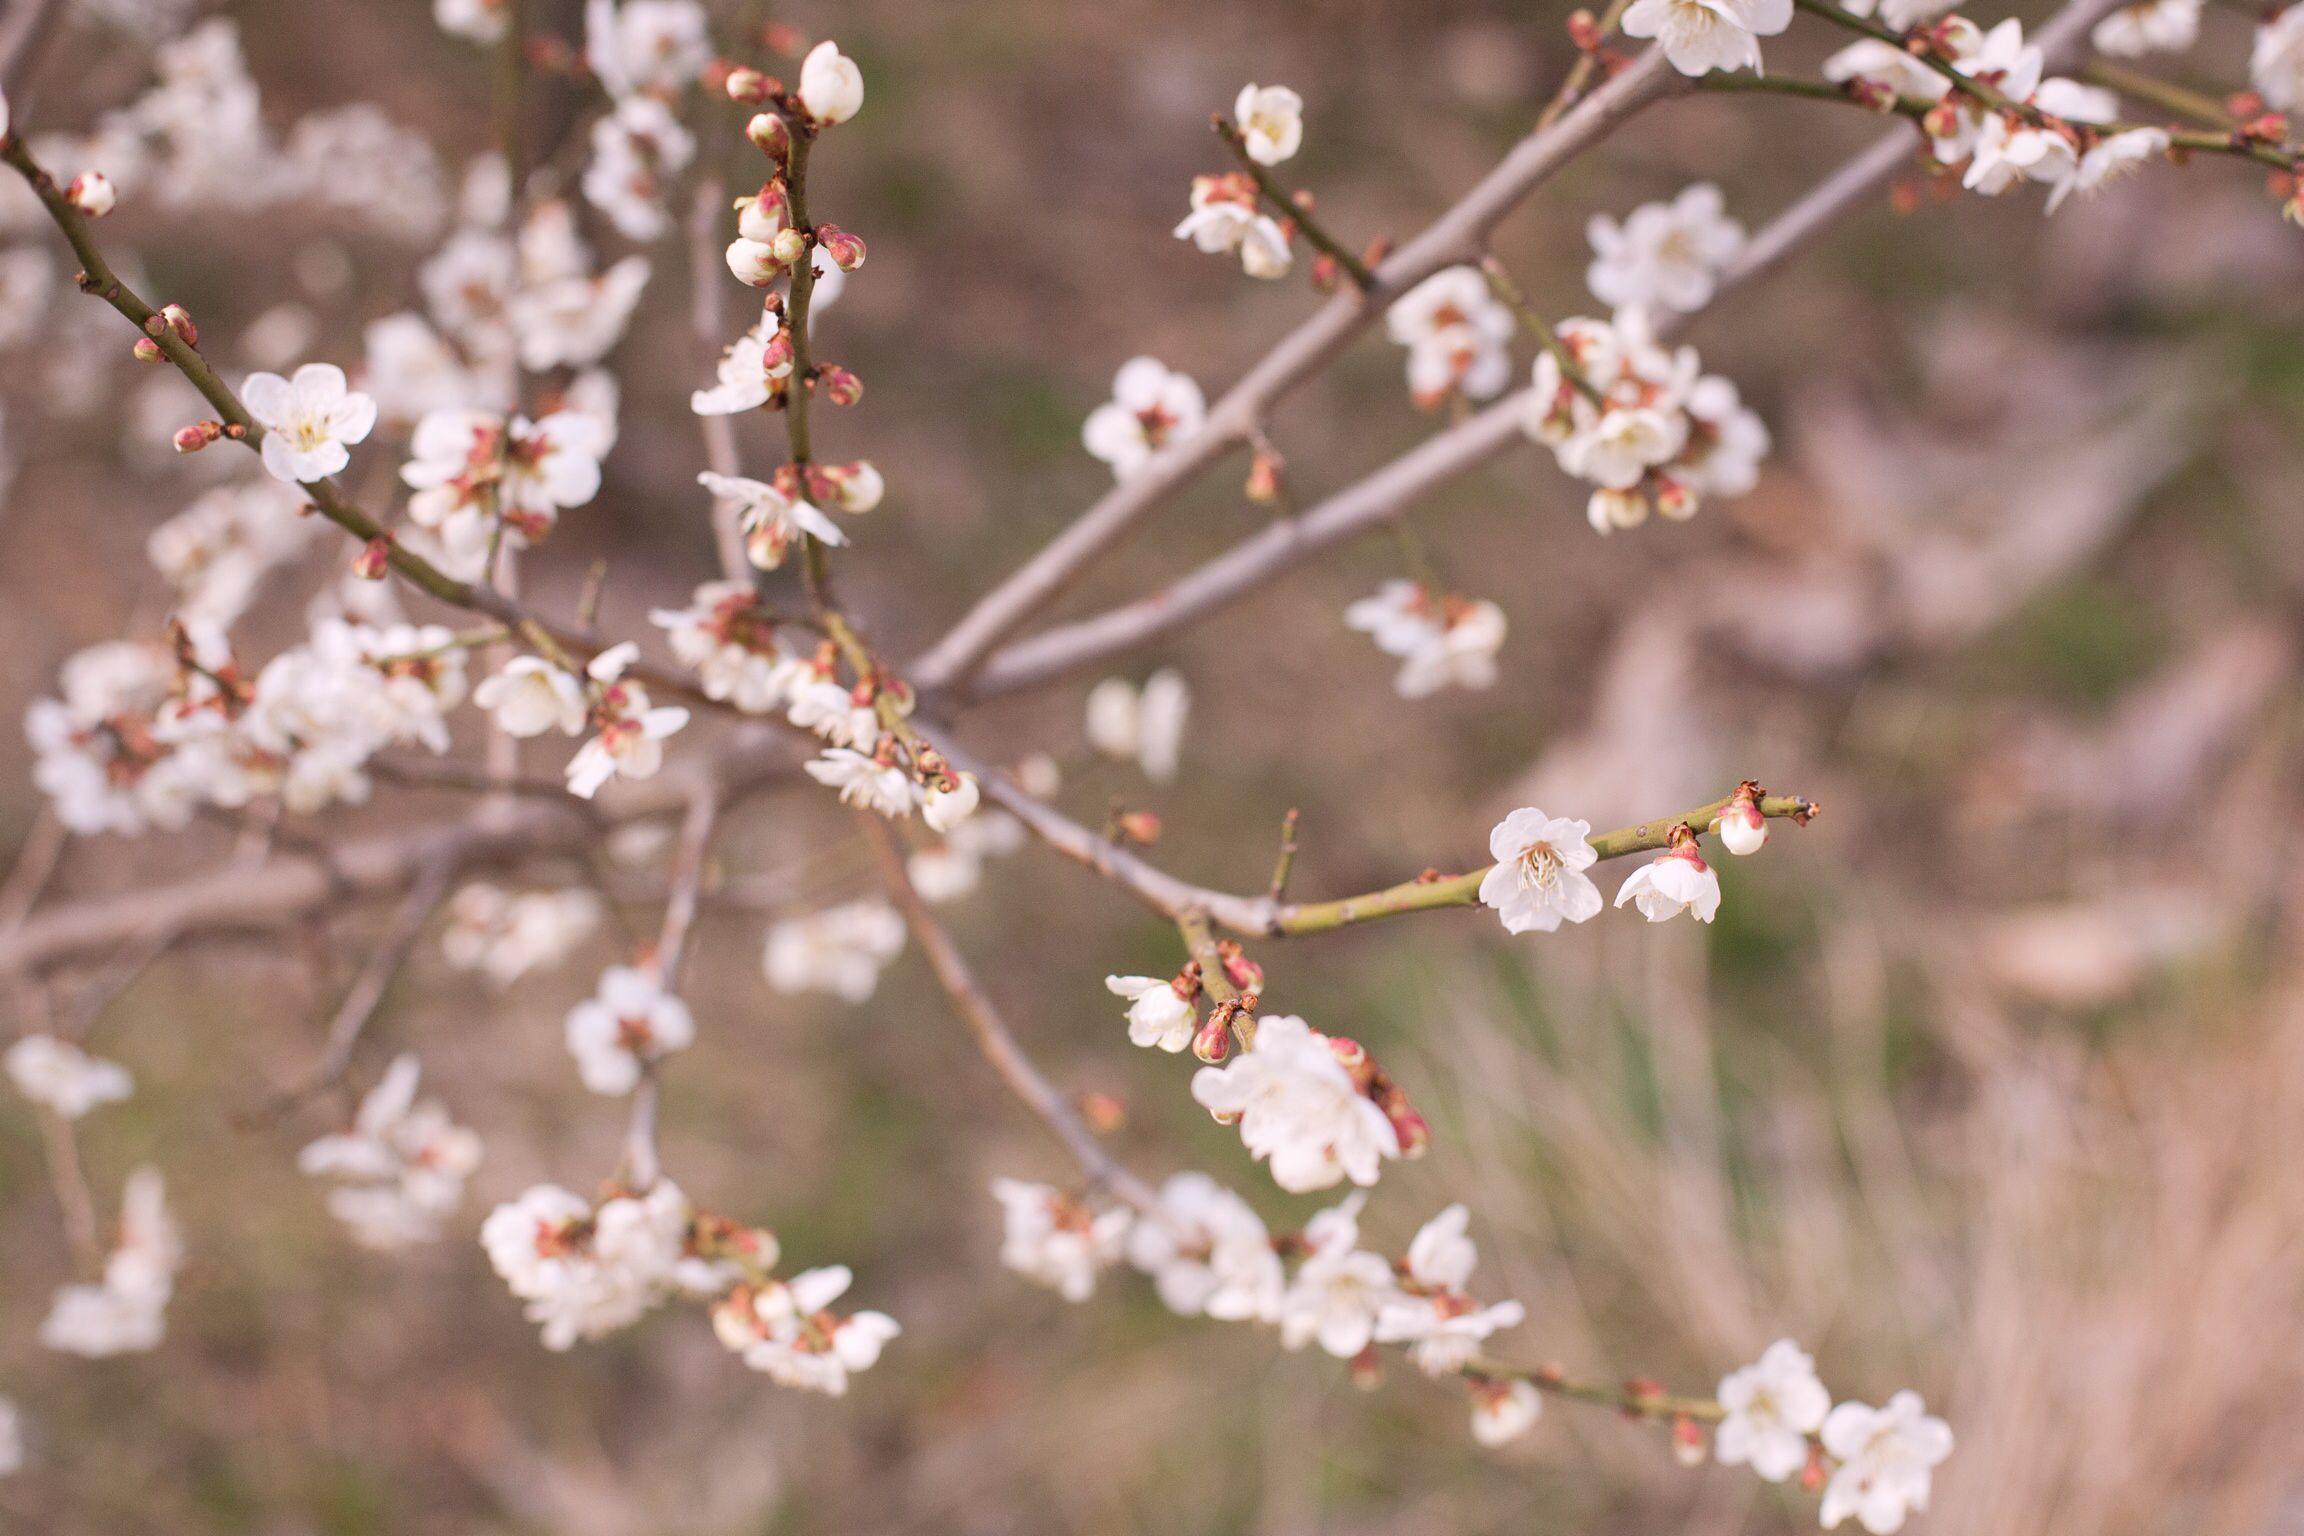 Japanese apricot flower :-)